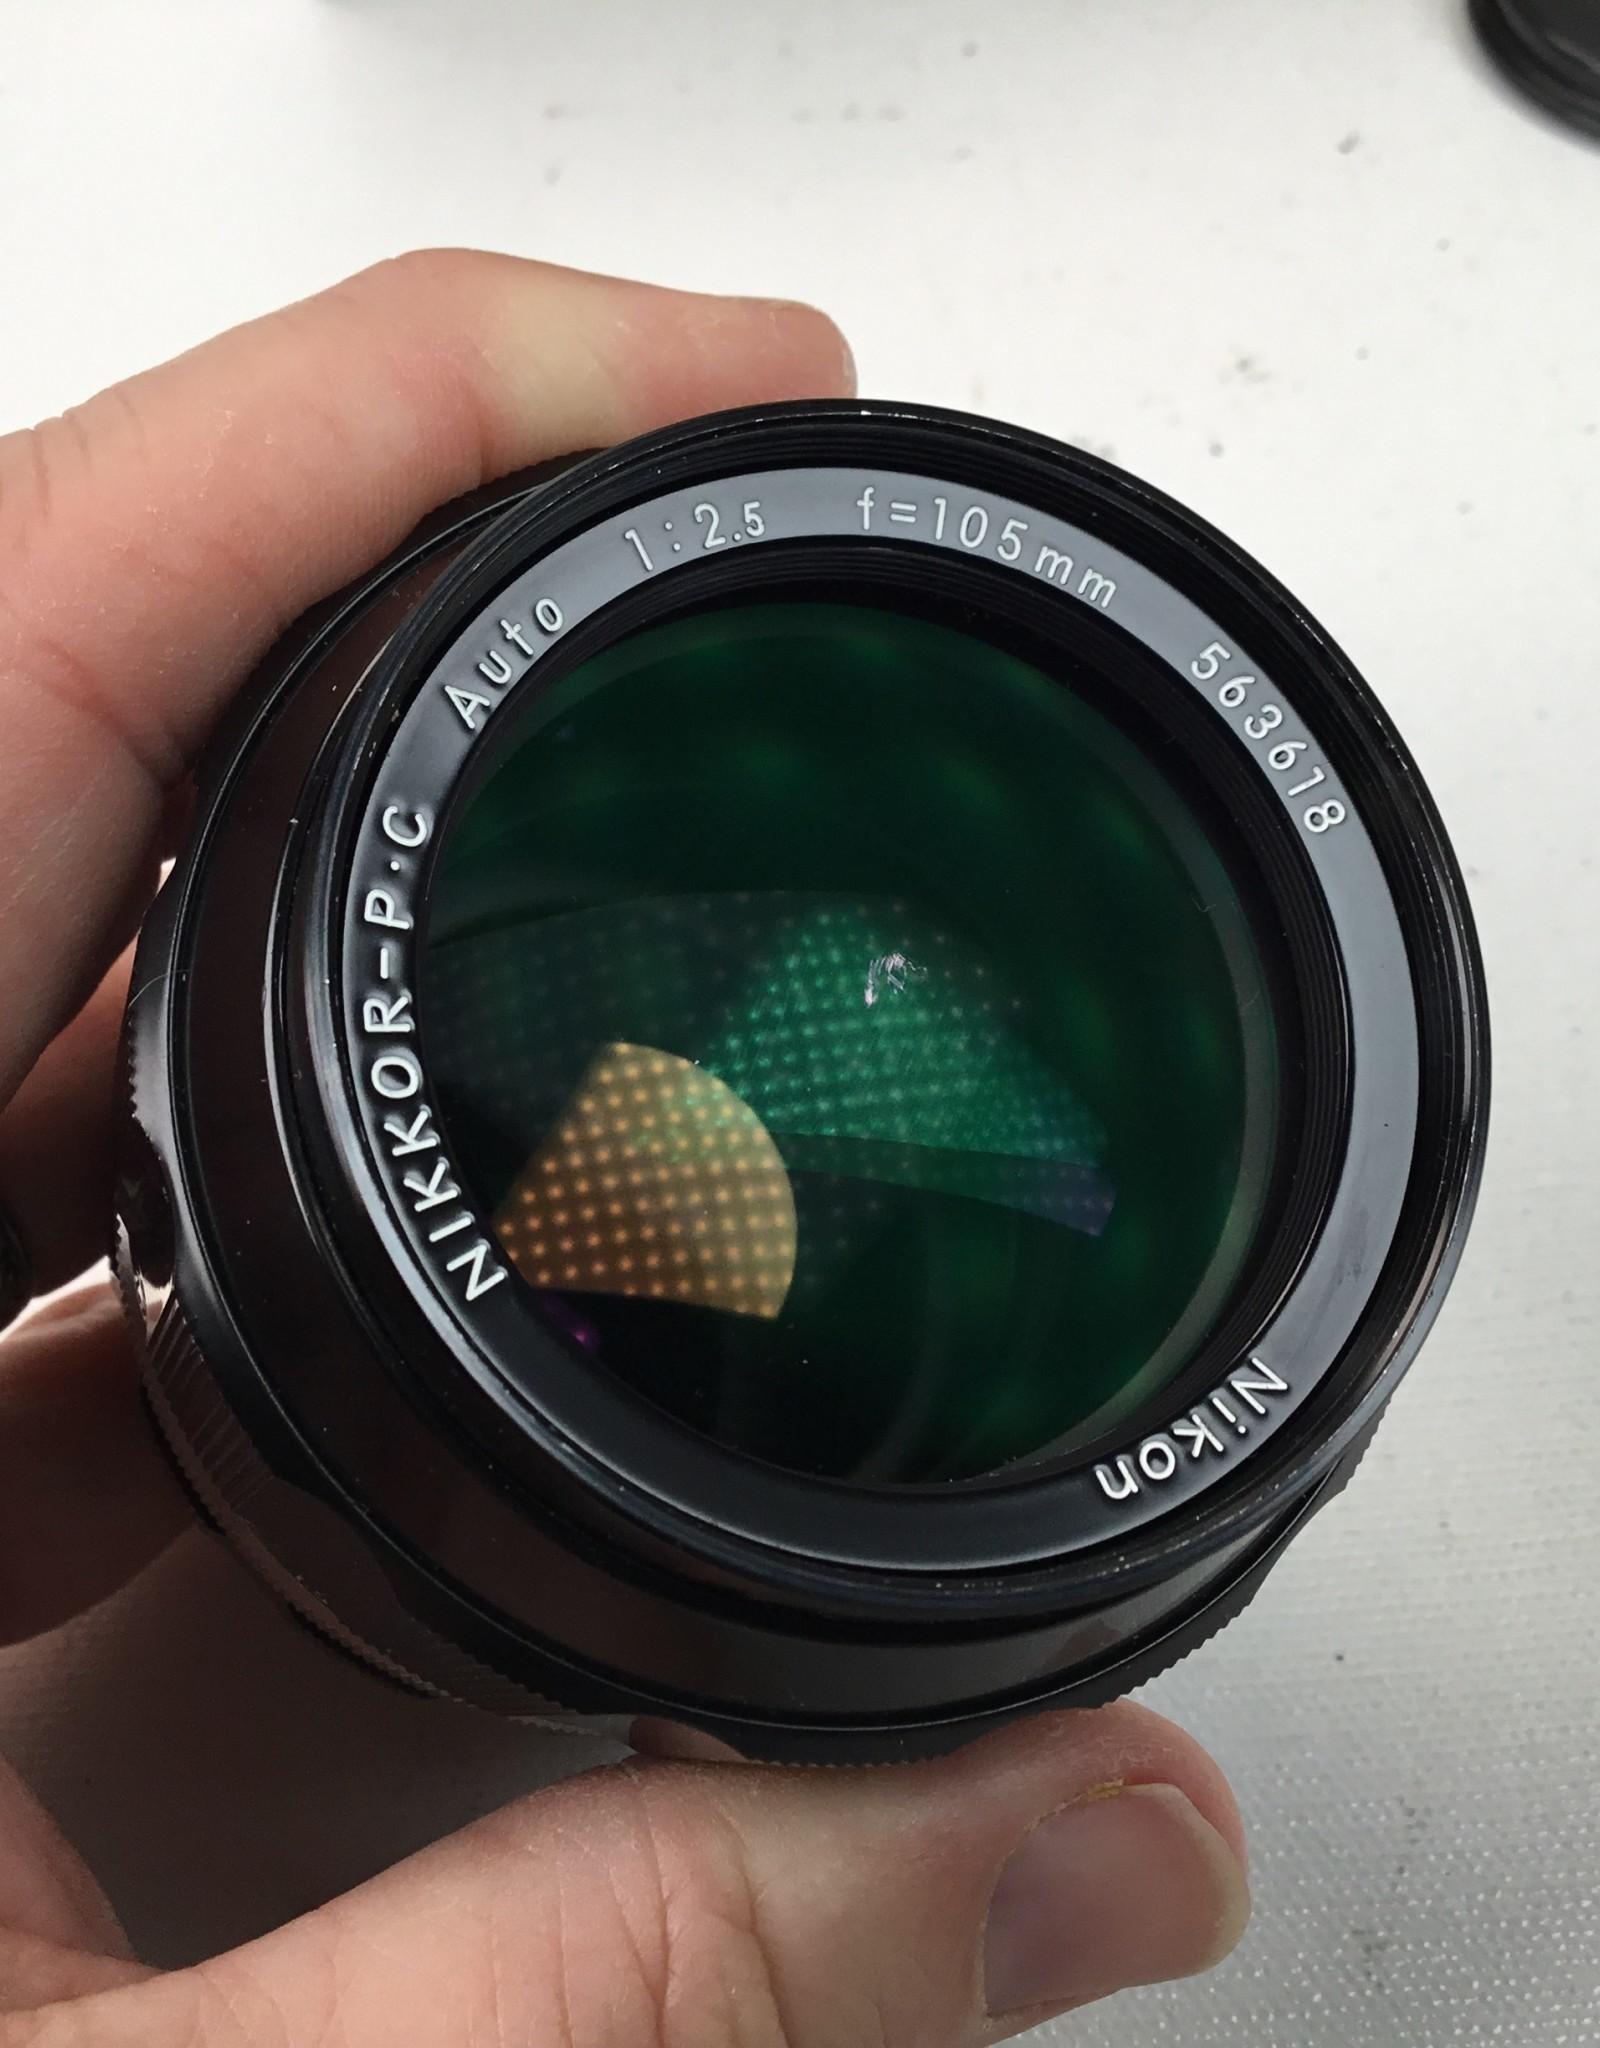 NIKON Nikon Nikkor PC 105mm f2.5 Non Ai Lens in Box Used EX